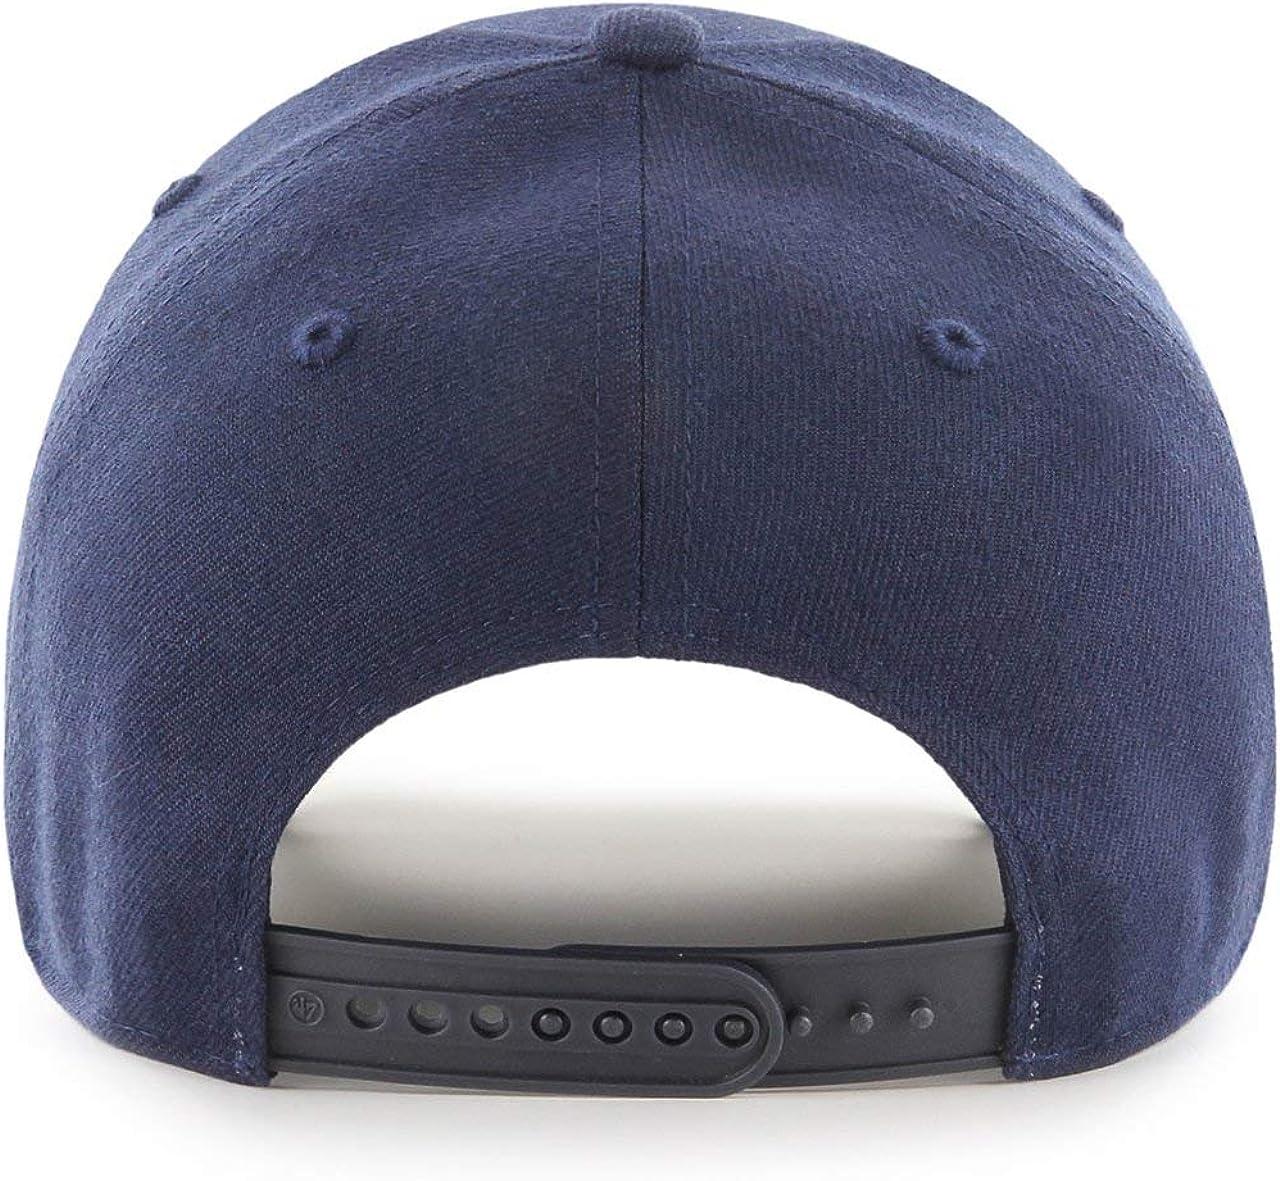 watch a few days away best service Amazon.com: '47 Brand MLB New York Yankees Metallic Snap MVP Cap ...